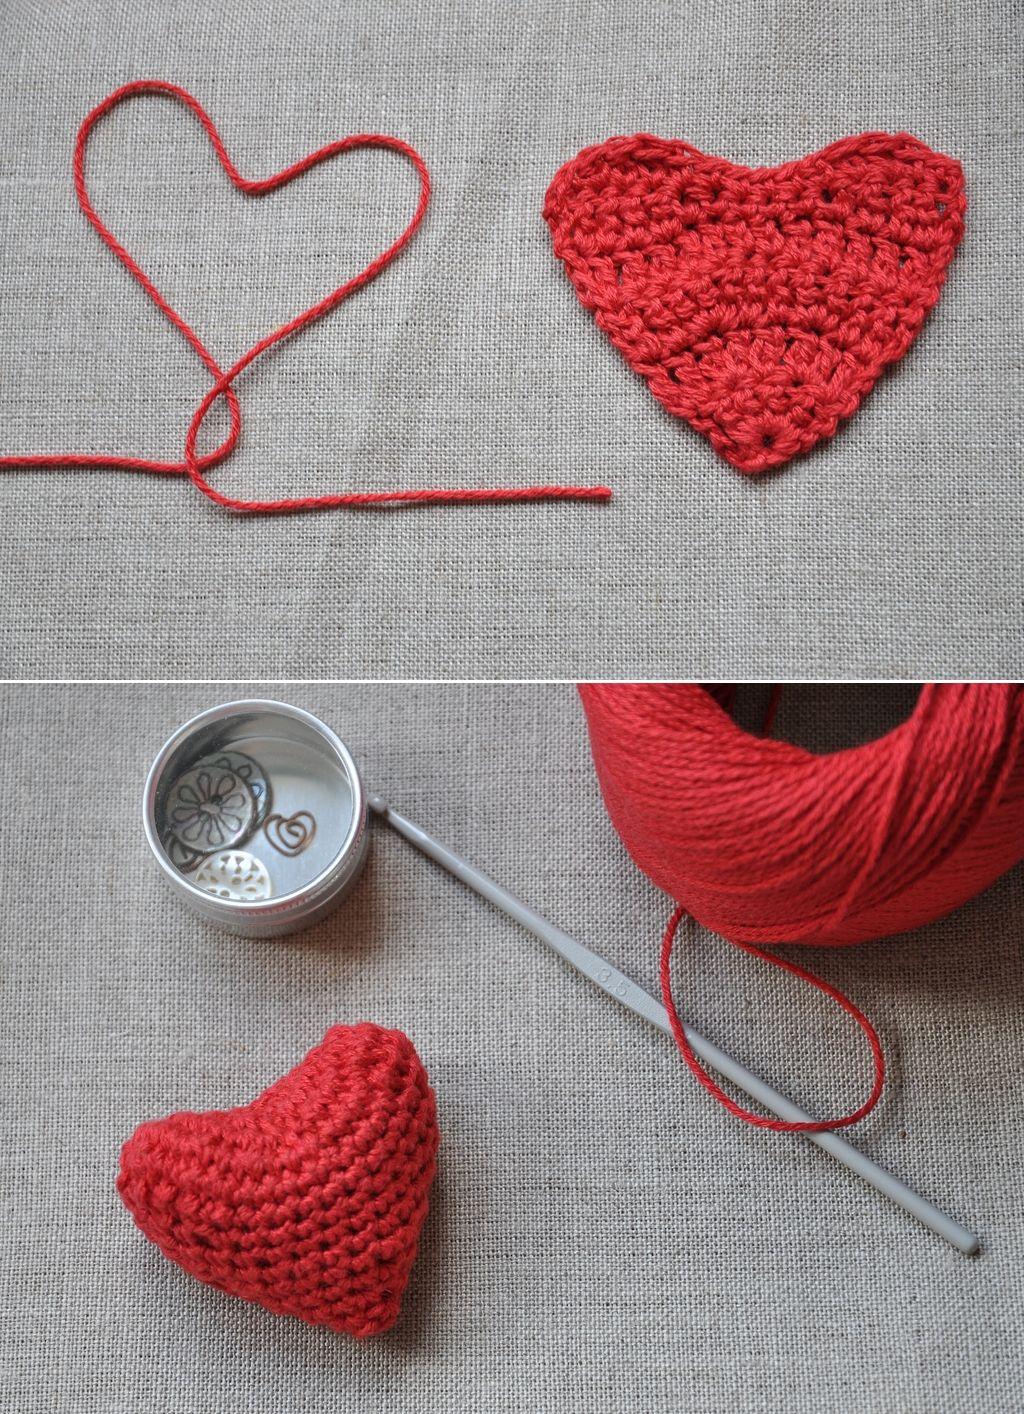 DIY: crocheted hearts | Yarn and String Crafts | Pinterest | Tejido ...